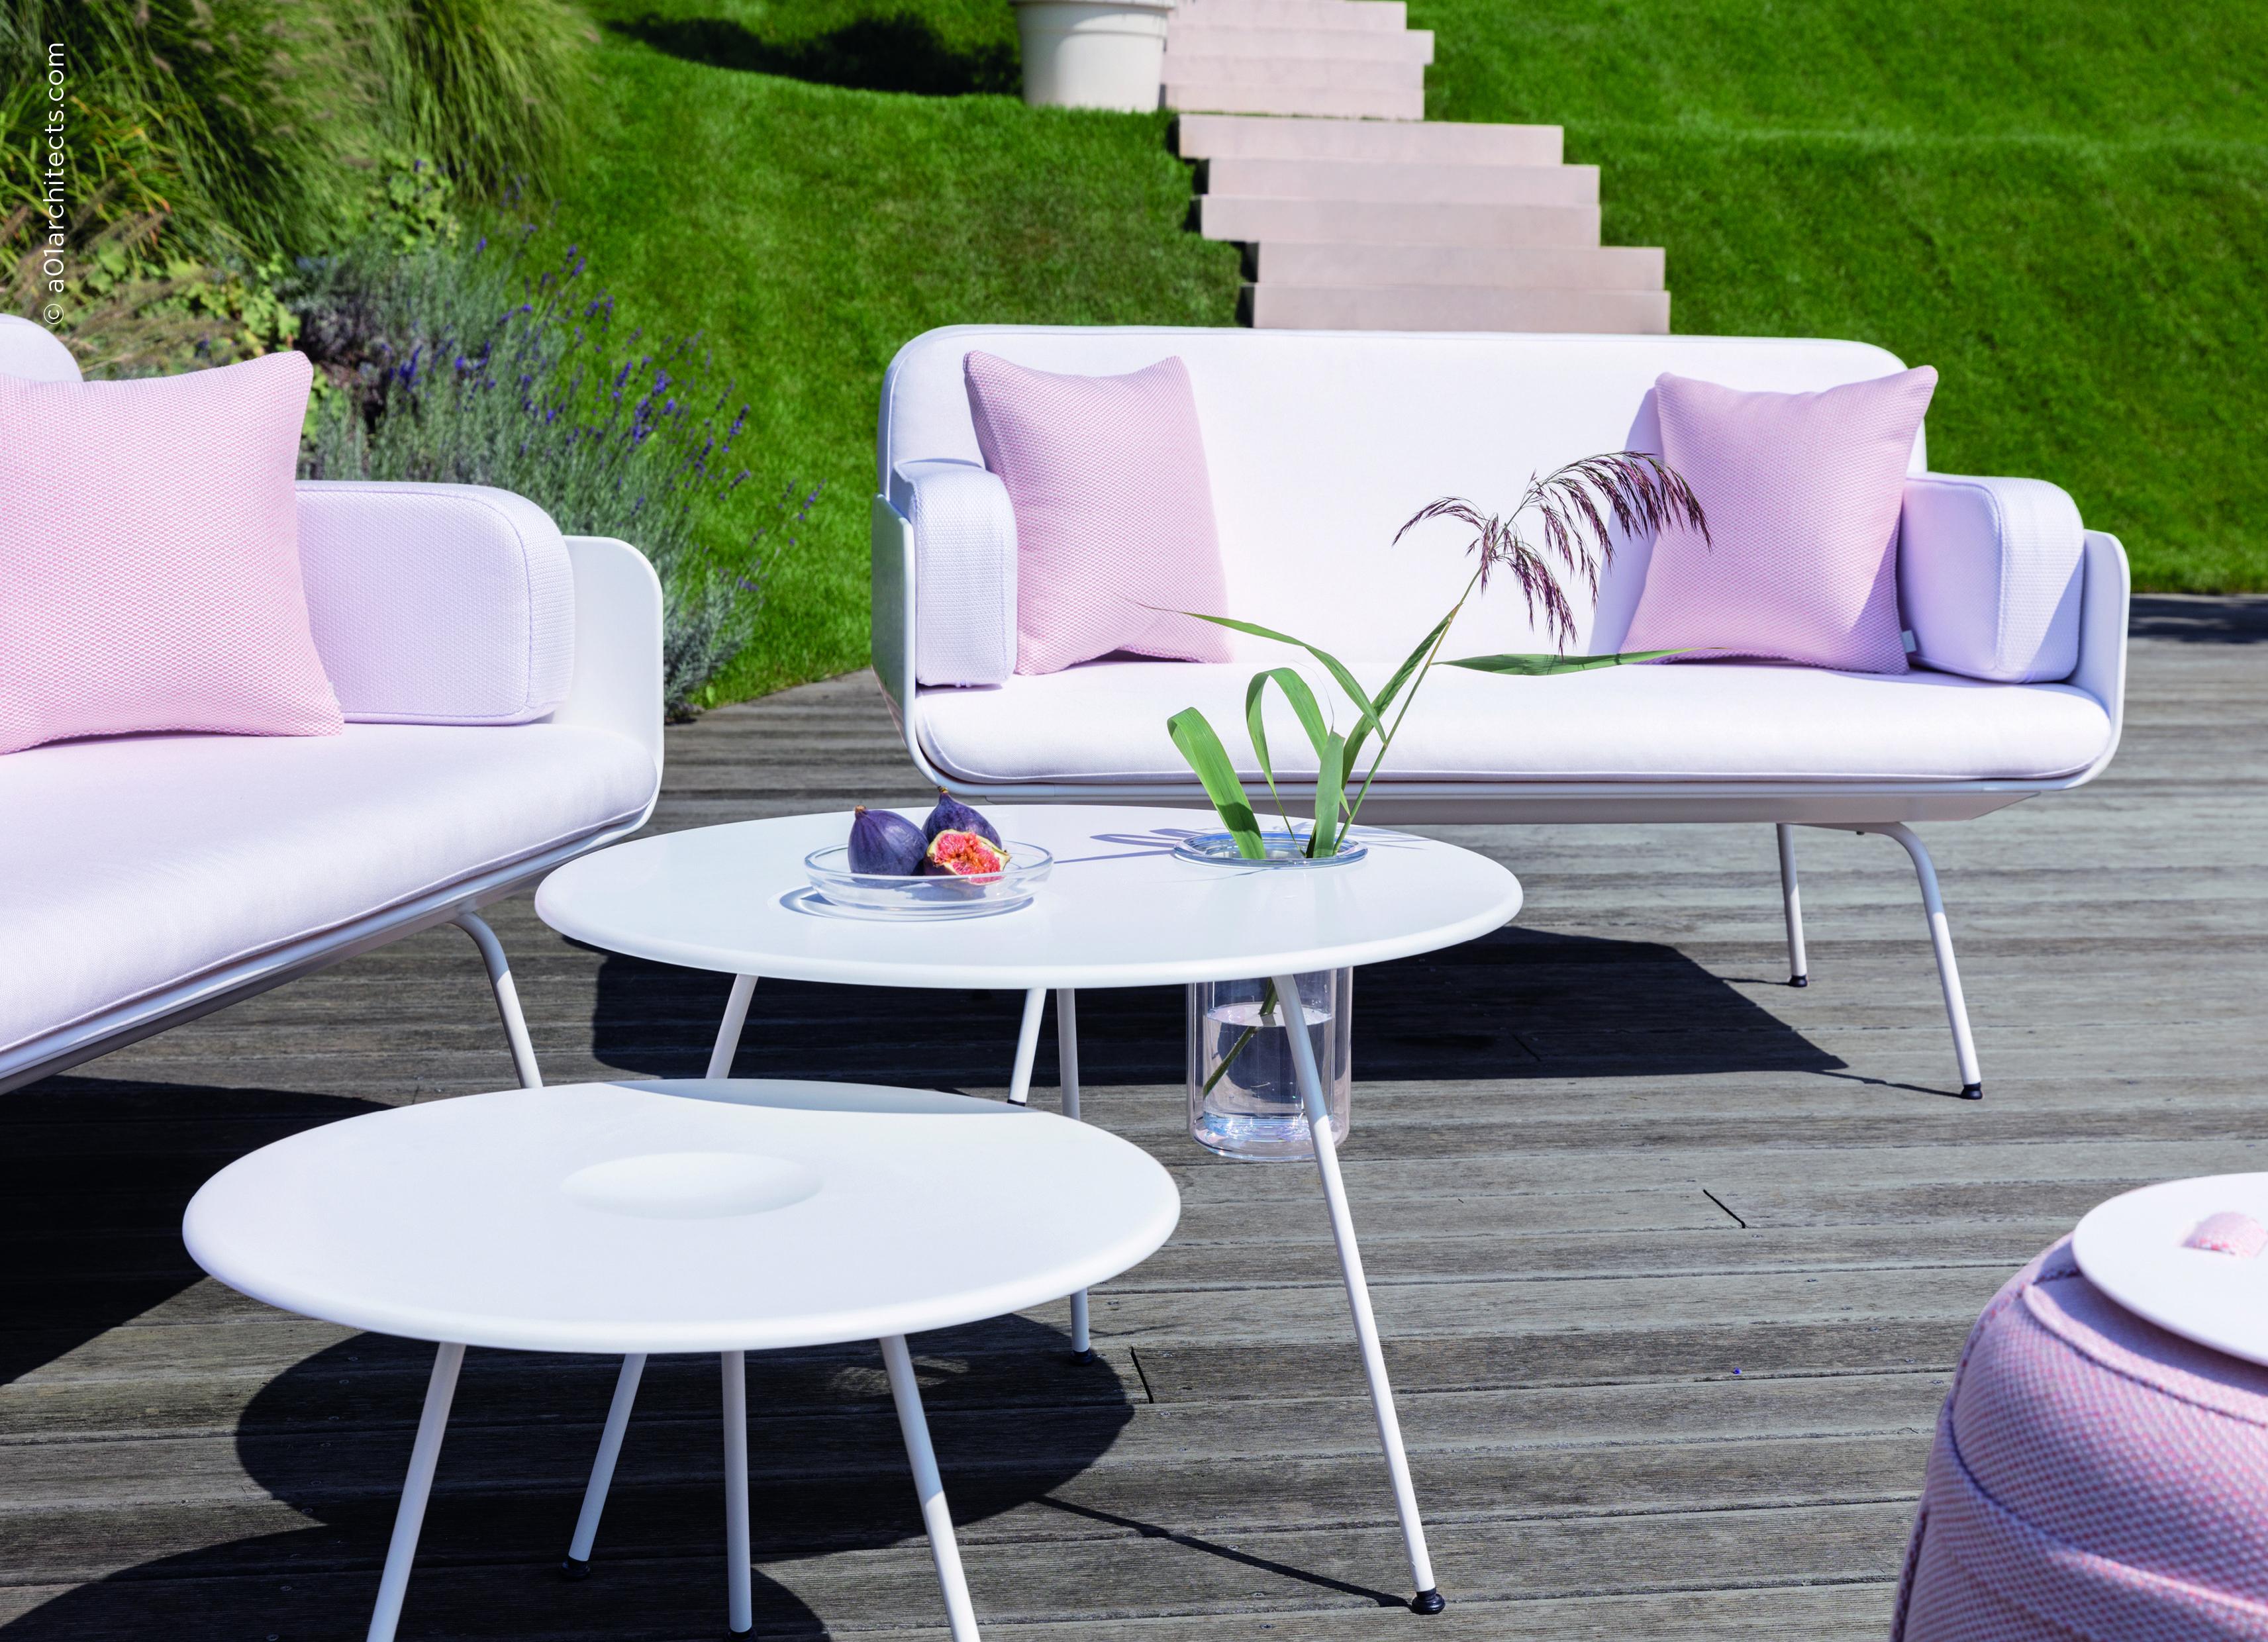 Salon De Jardin Corian Haut De Gamme Collection Air Viteo In 2020